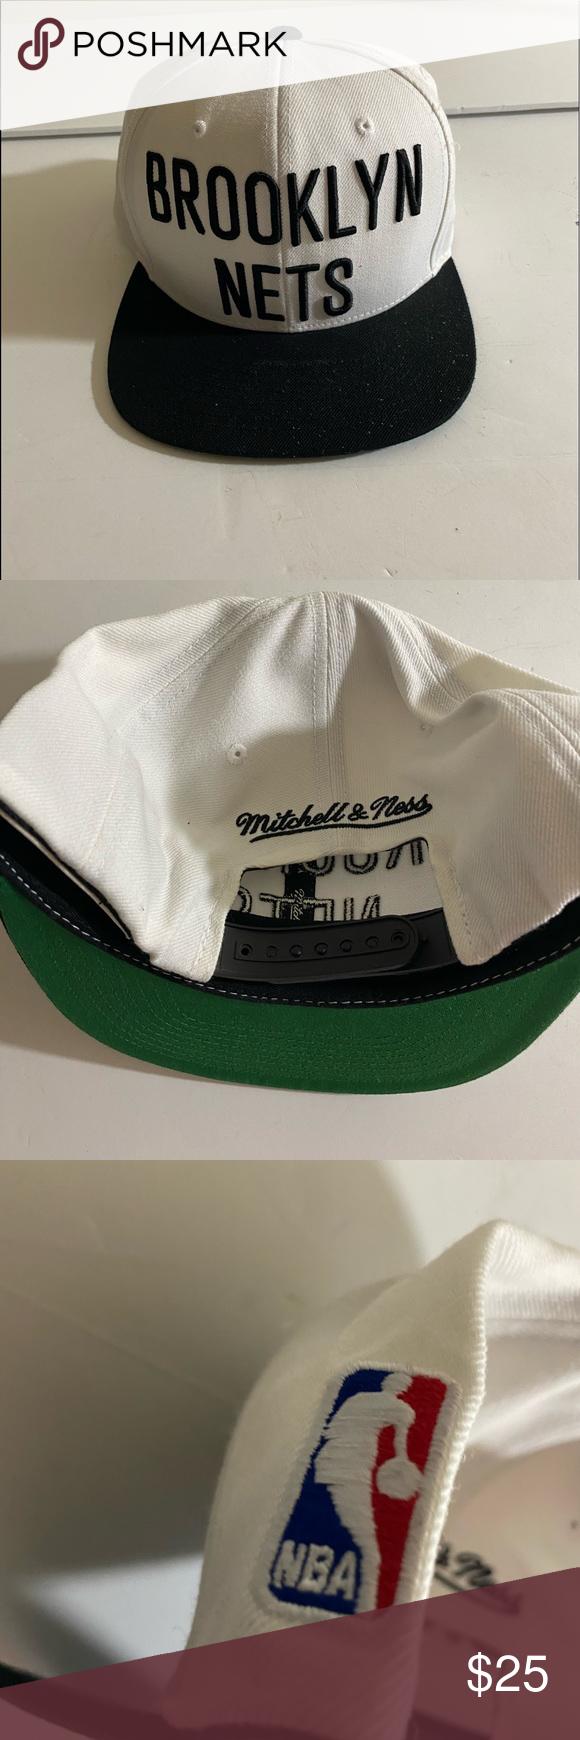 Chicago Blackhawks Reebok hat. Excellent condition